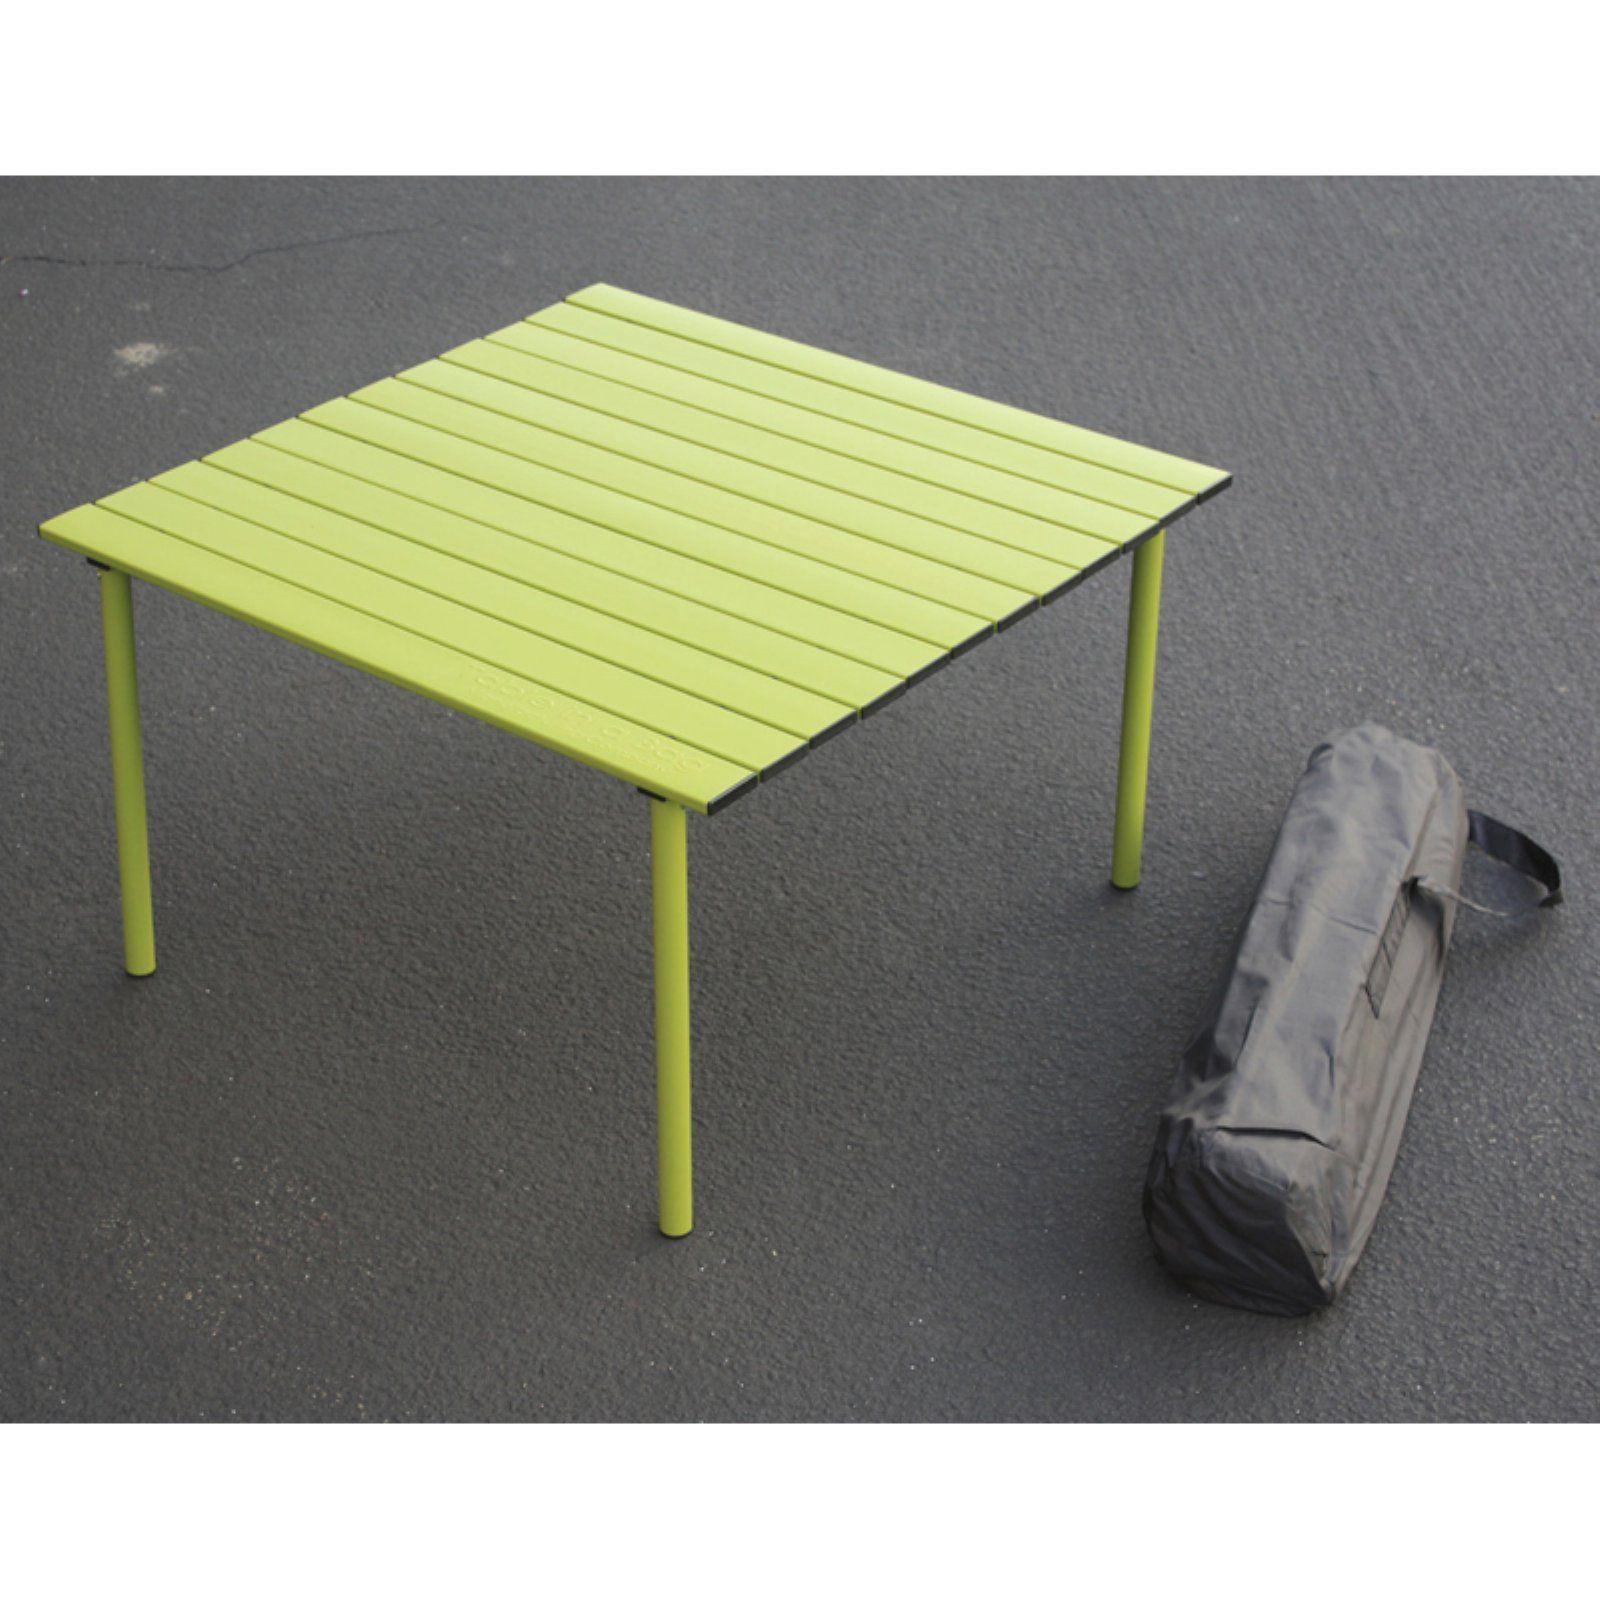 Low Picnic Table Bag Aluminum Adirondack And 12 Similar Items. S L1600